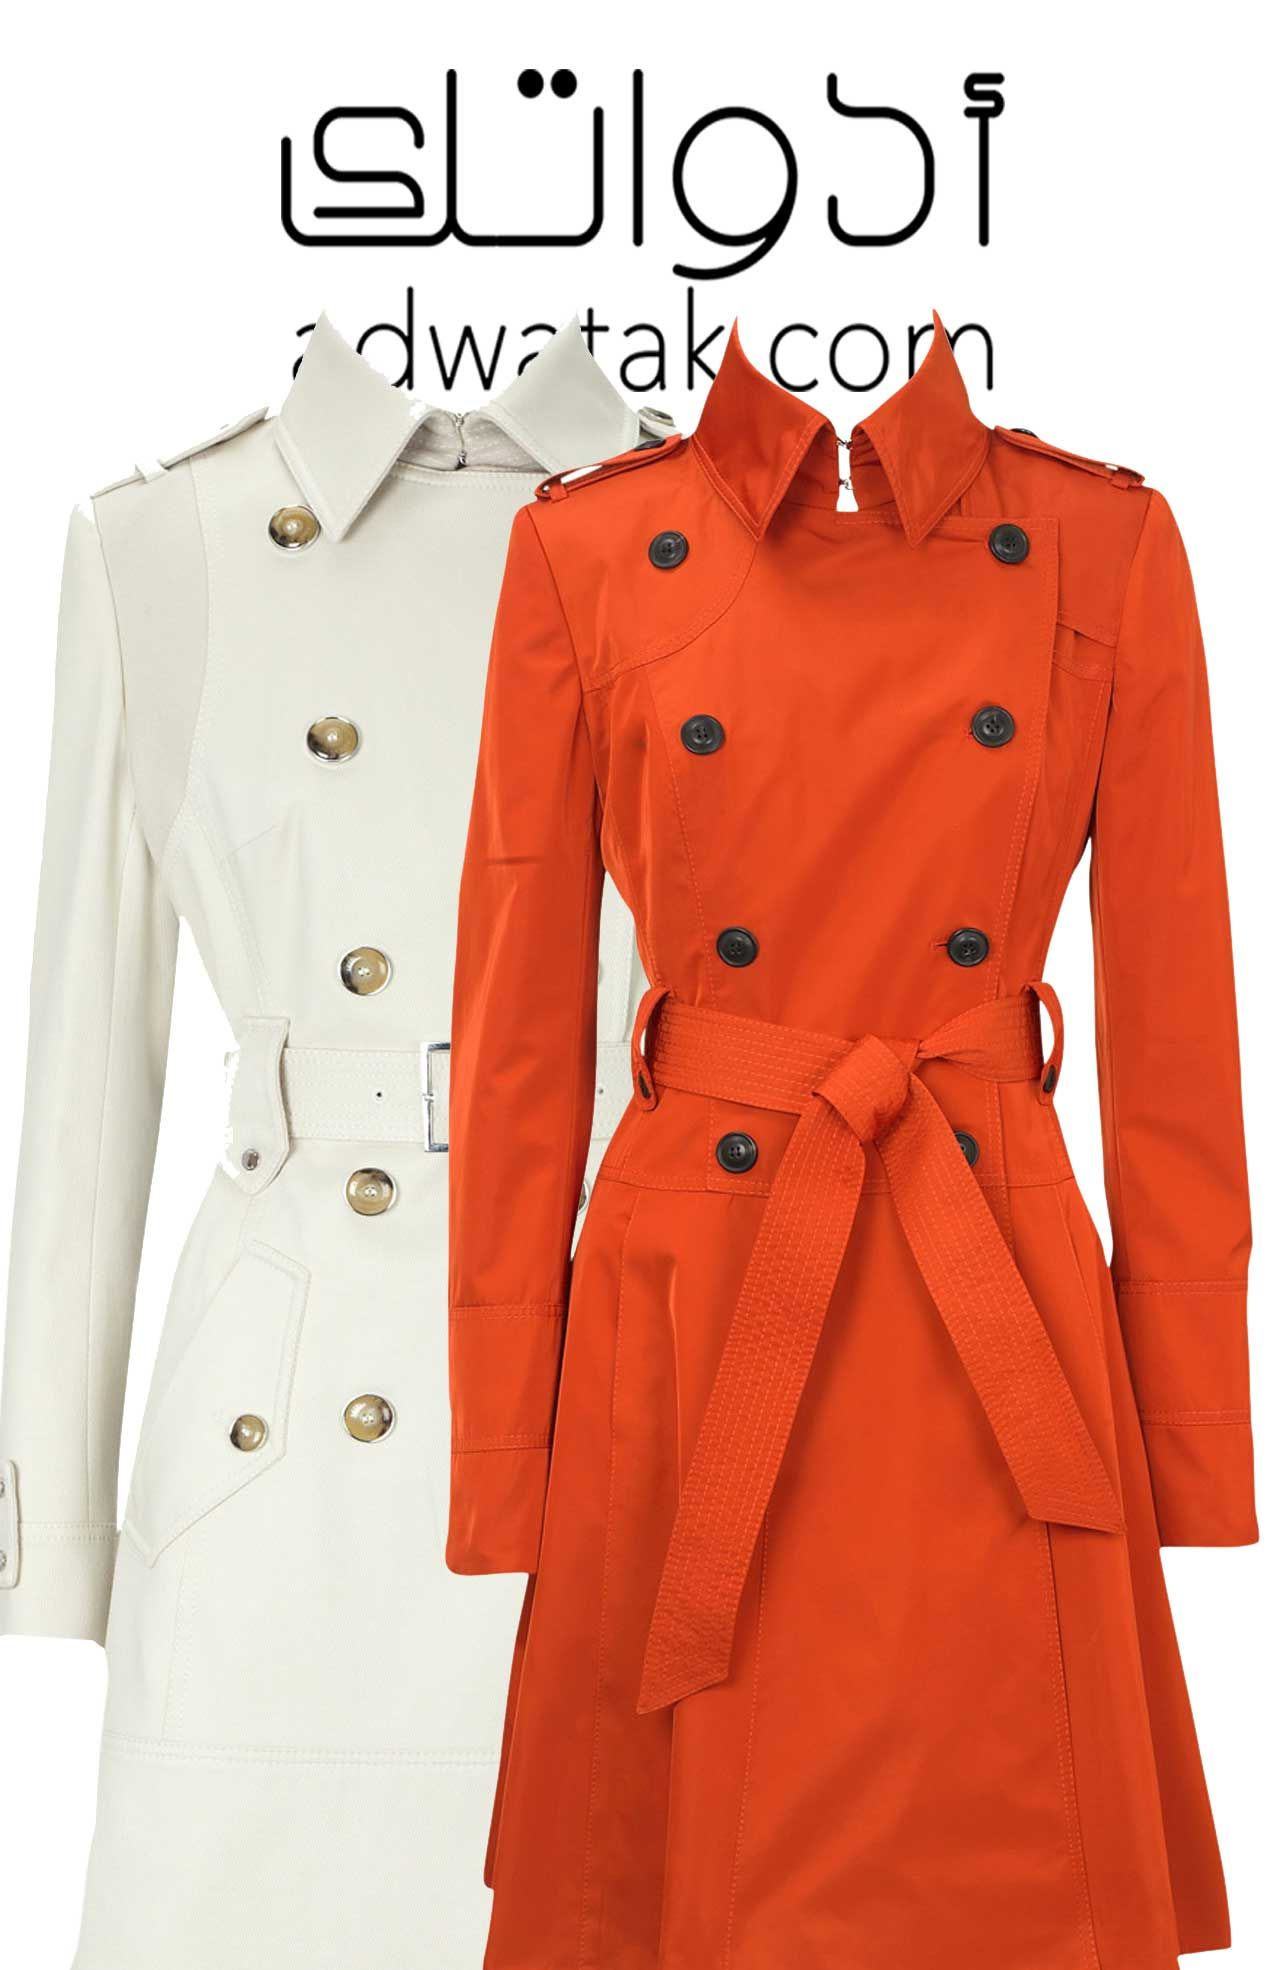 جواكت حريمي Trench Coat Coat Jackets